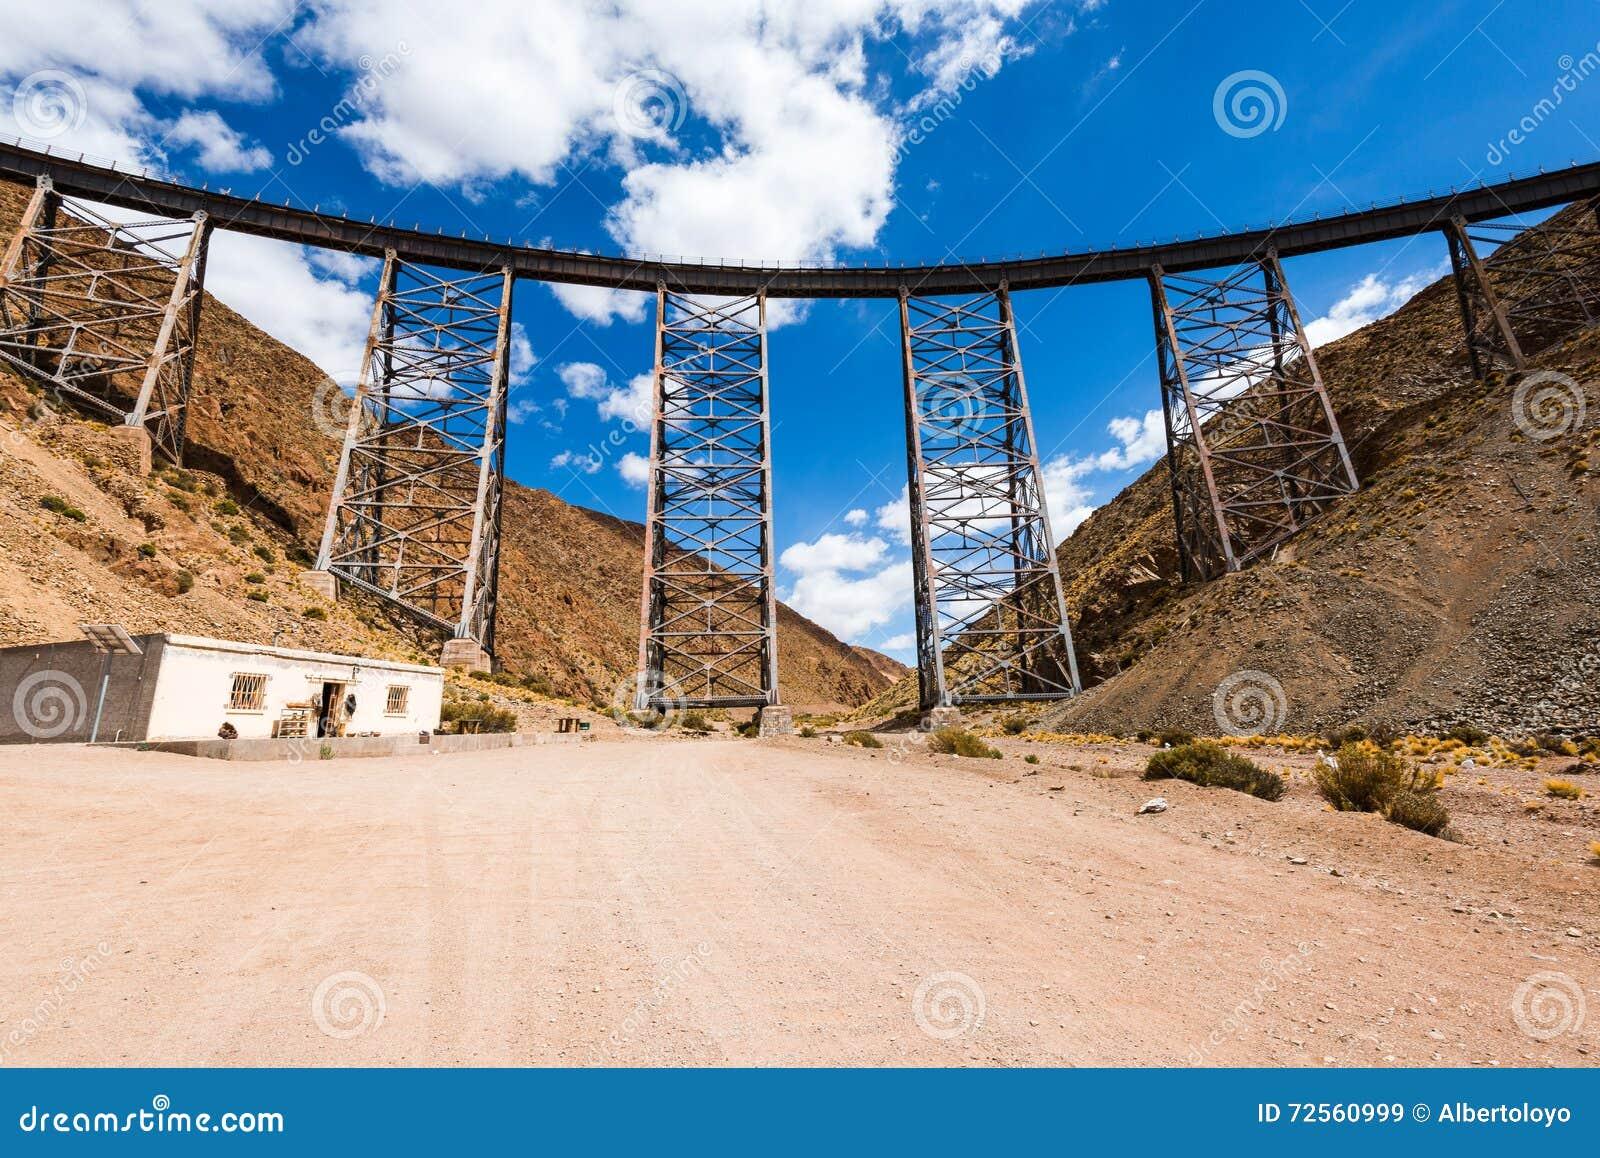 LaPolvorilla viadukt, Salta (Argentina)